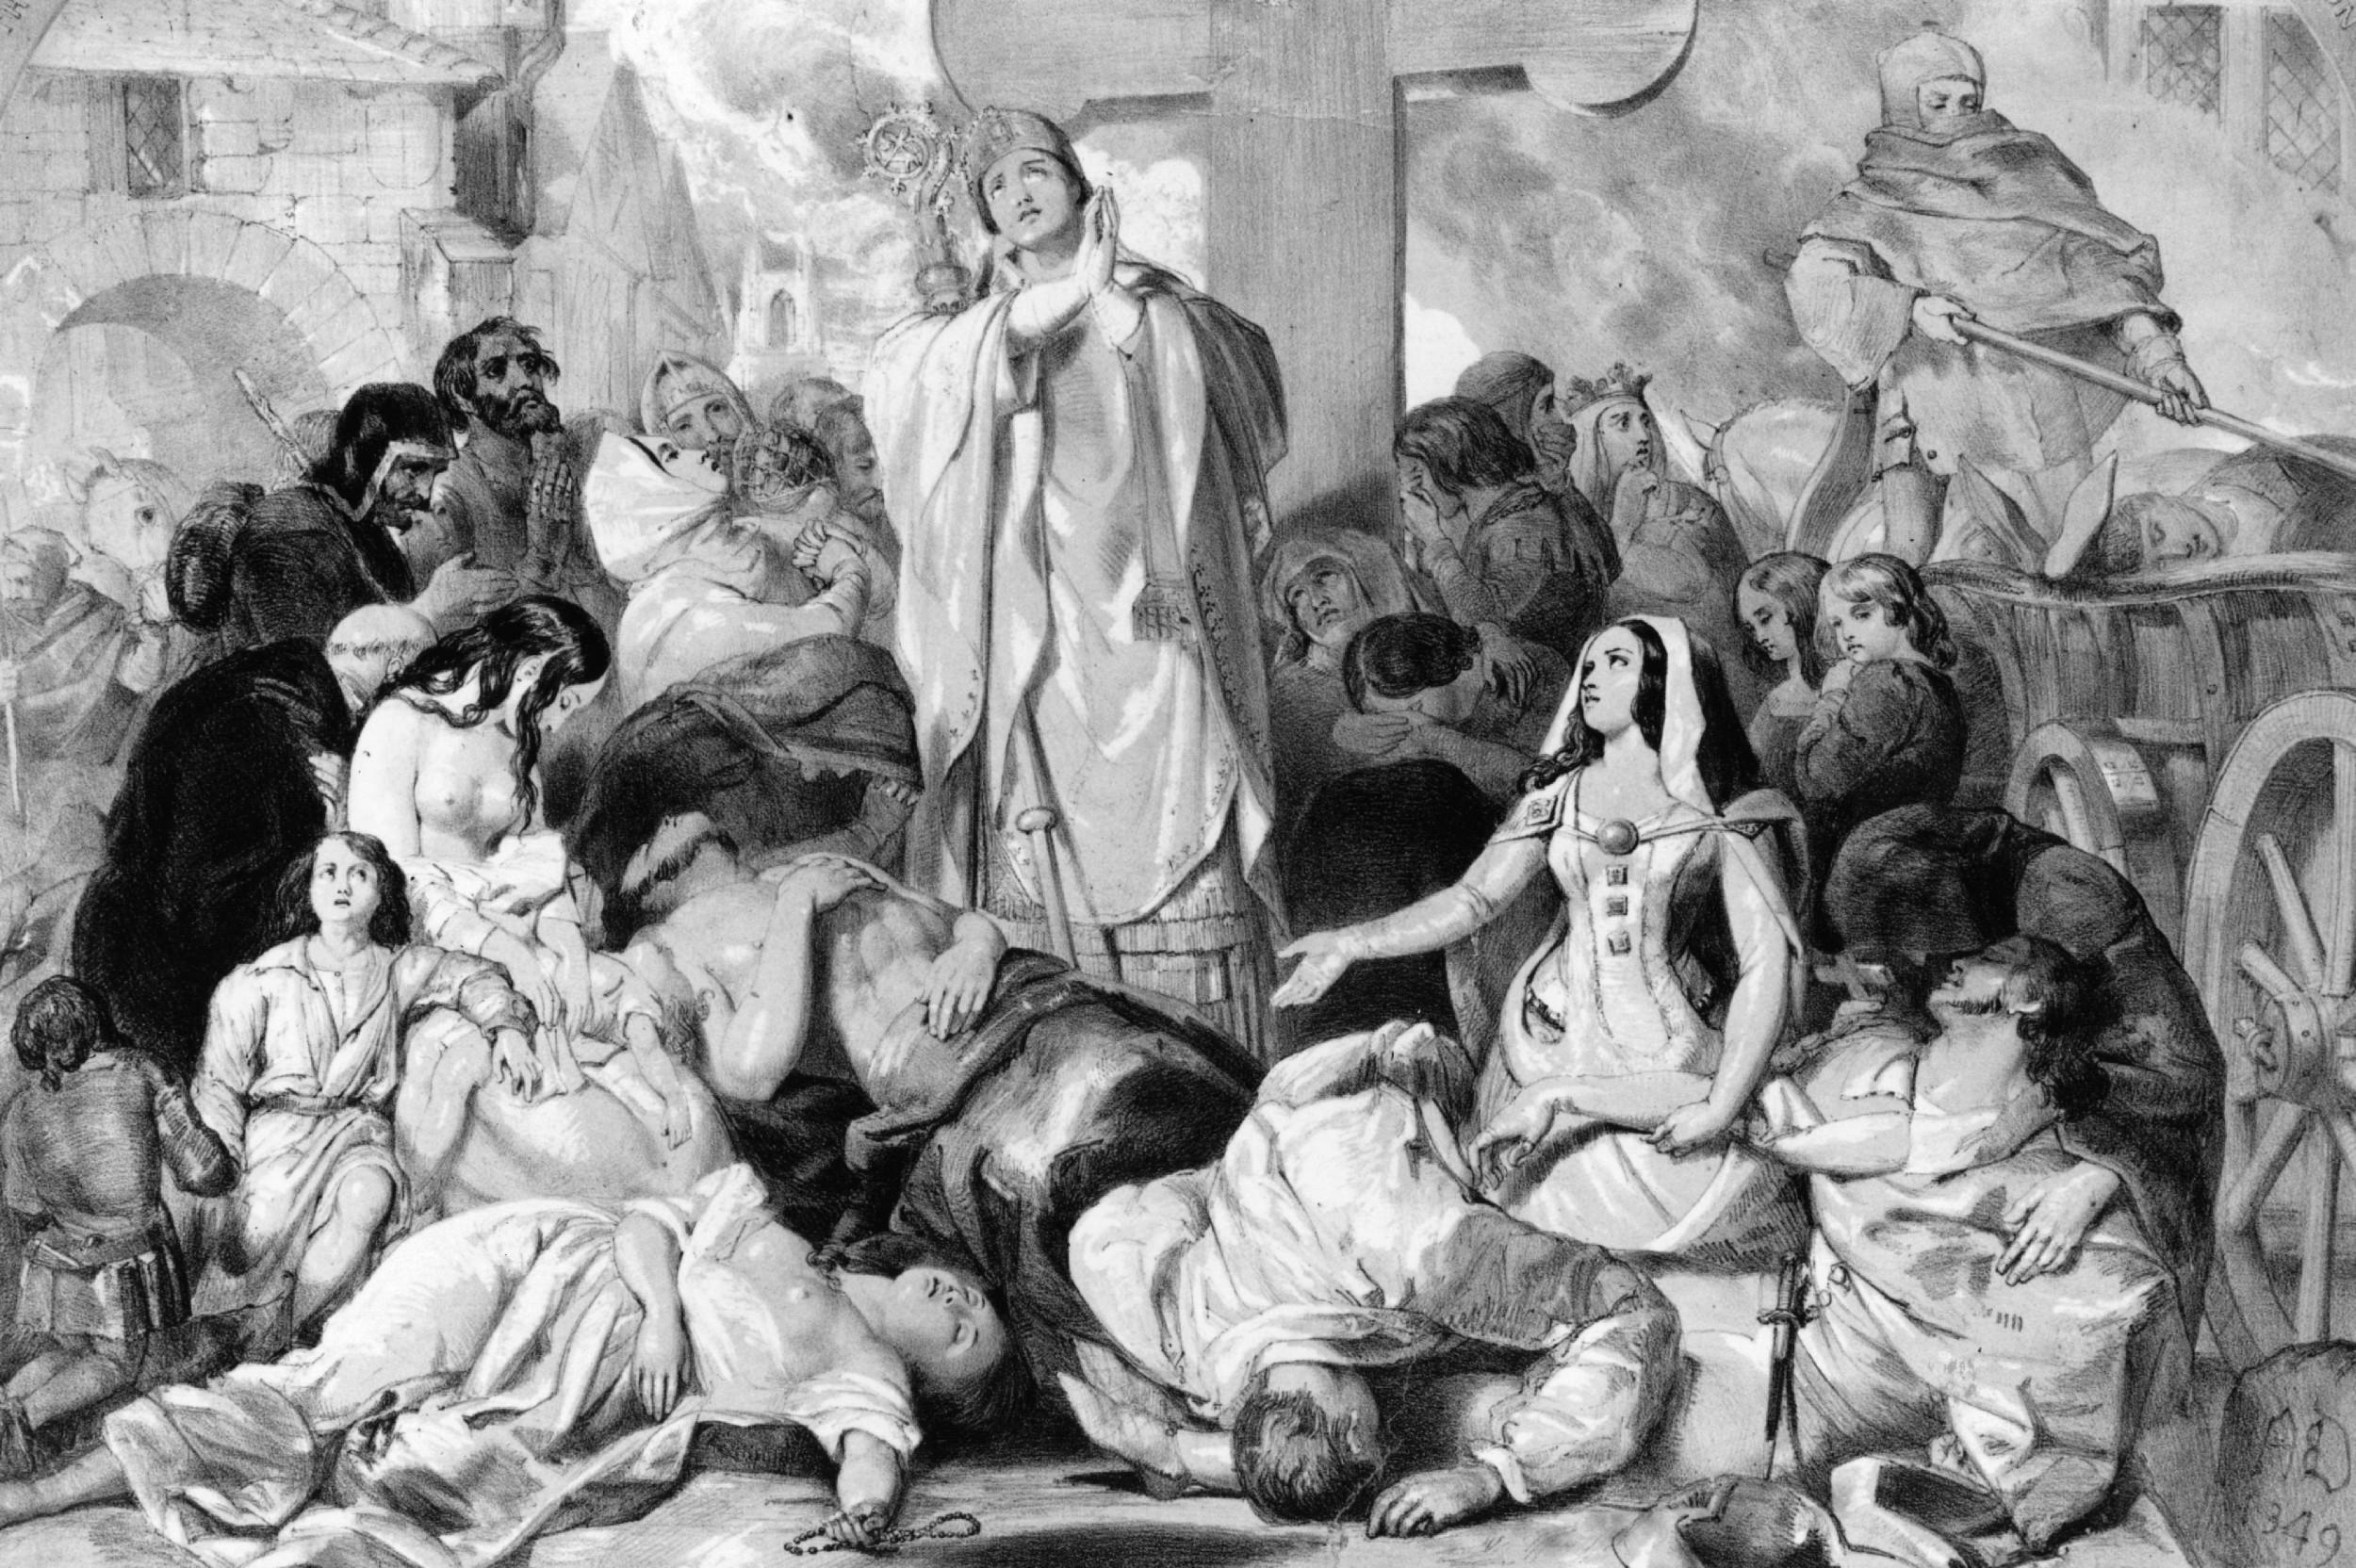 Ljudi se mole za izbavljenje od bubonske kuge, oko 1350. godine (Foto: Hulton Archive/Getty Images)